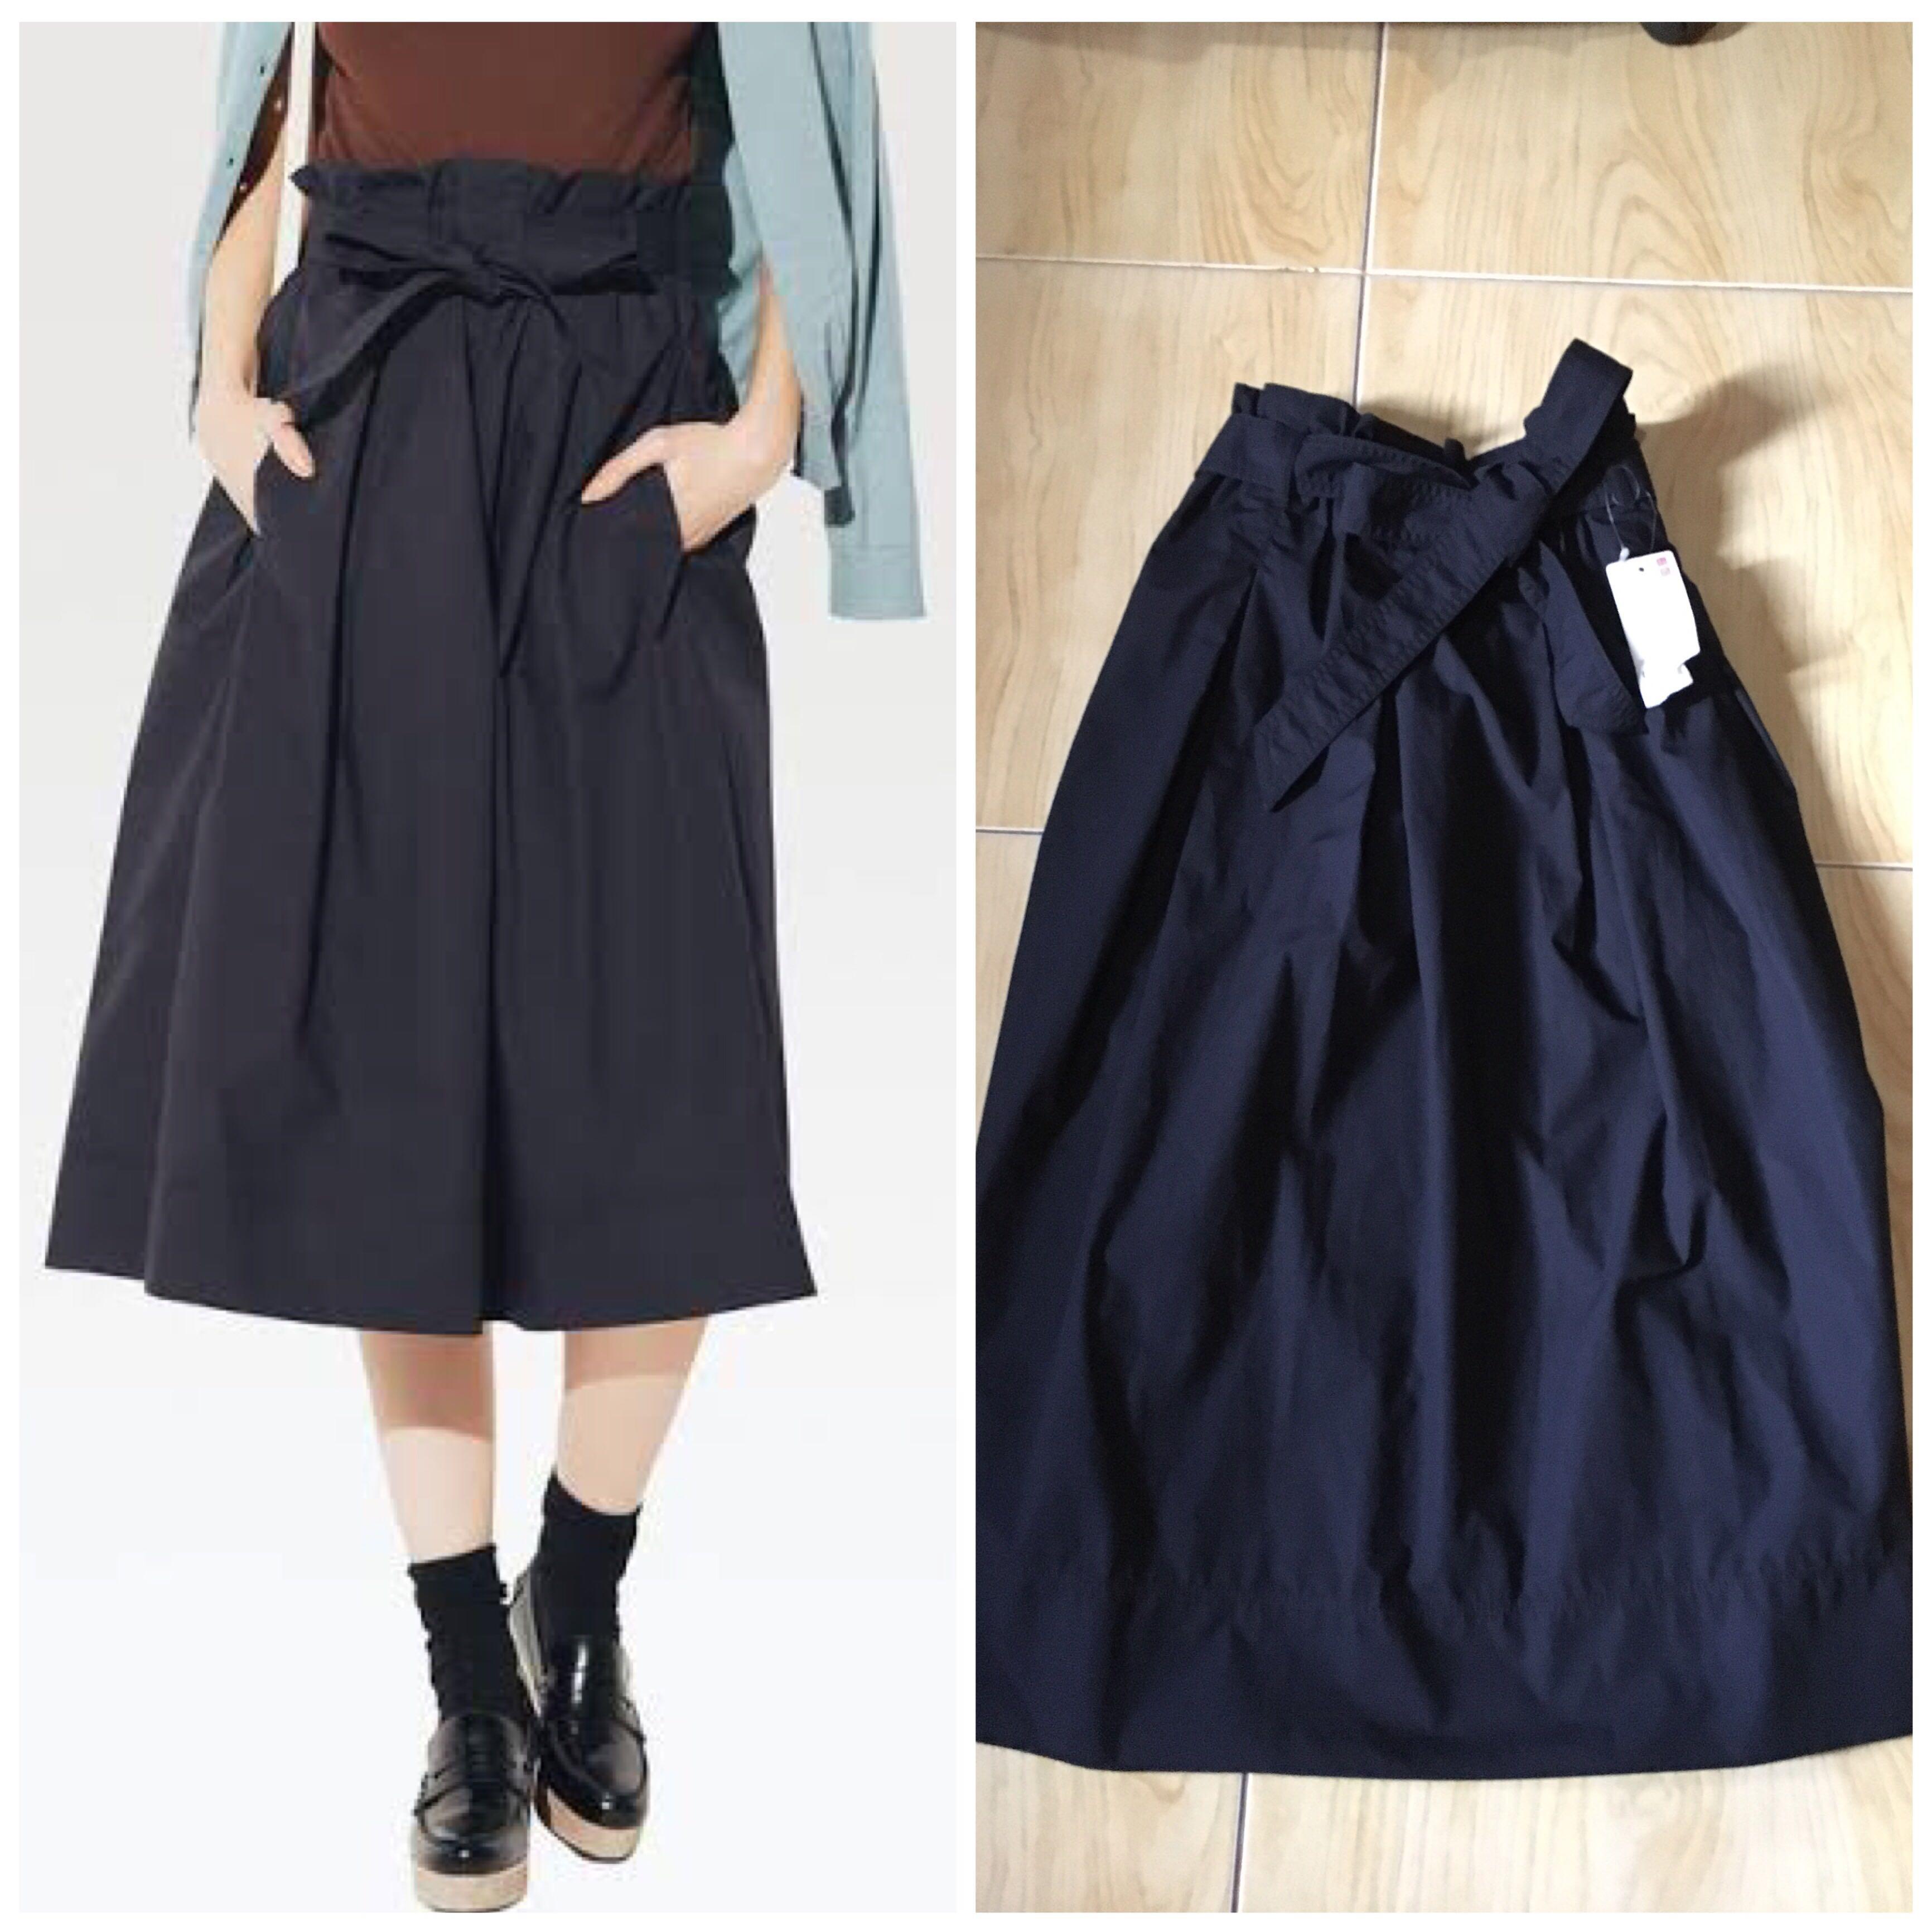 1d7e55754c jual rugi uniqlo belted flare midi skirt navy, Olshop Fashion ...